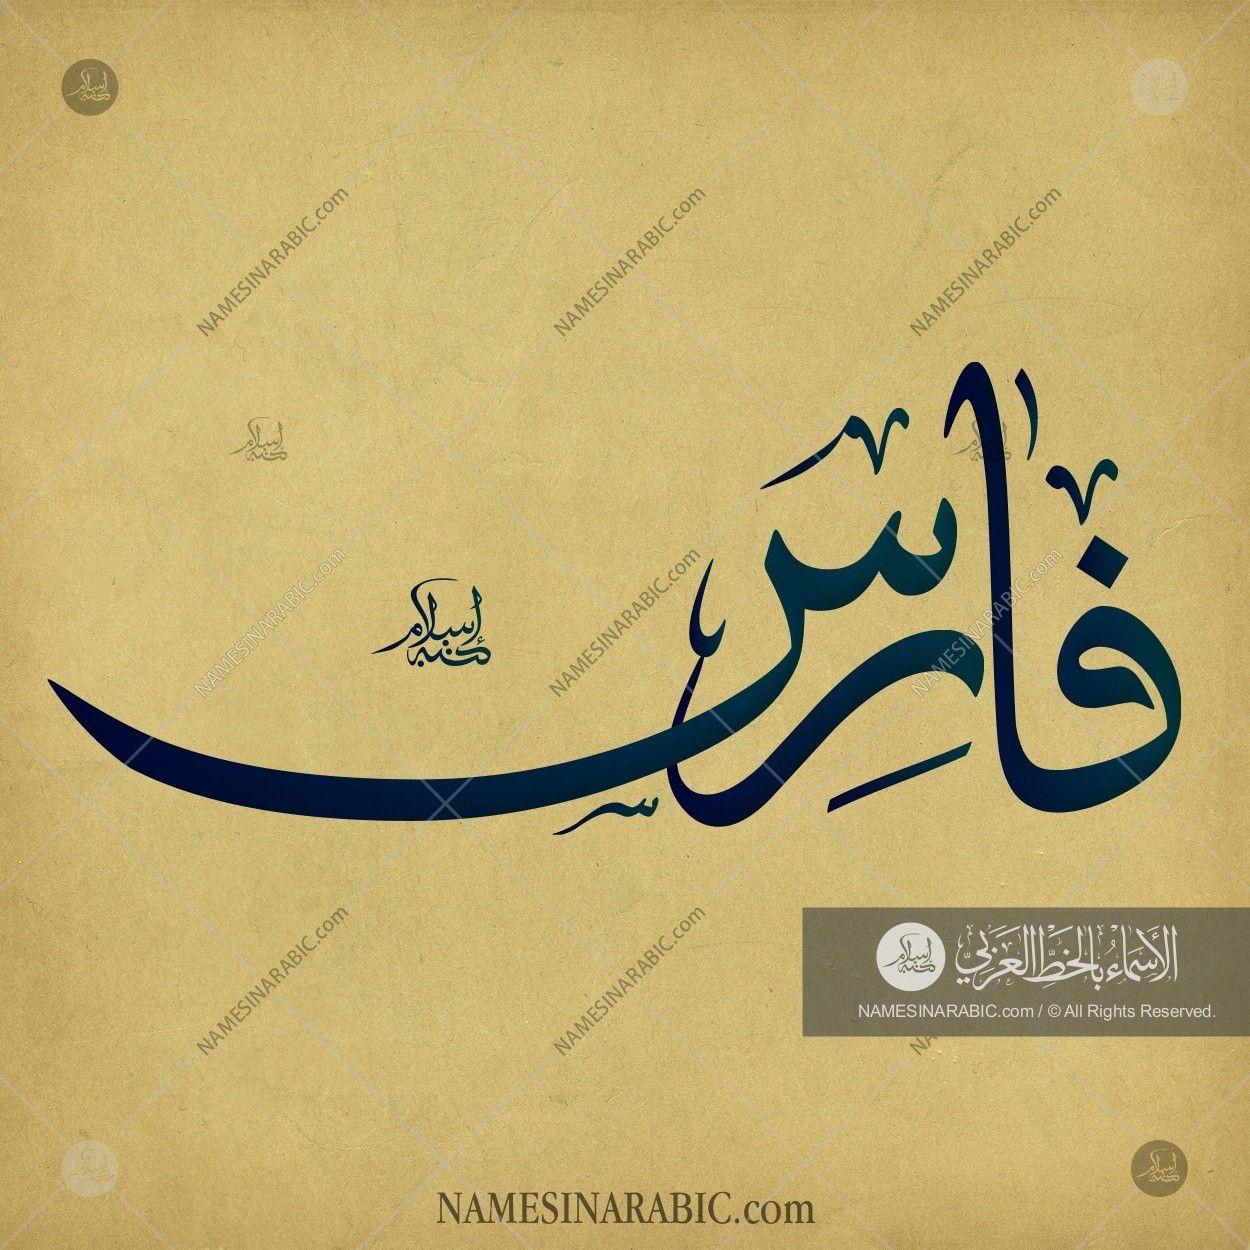 Faris فارس Names In Arabic Calligraphy Name 2943 Calligraphy Name Calligraphy Arabic Calligraphy Design